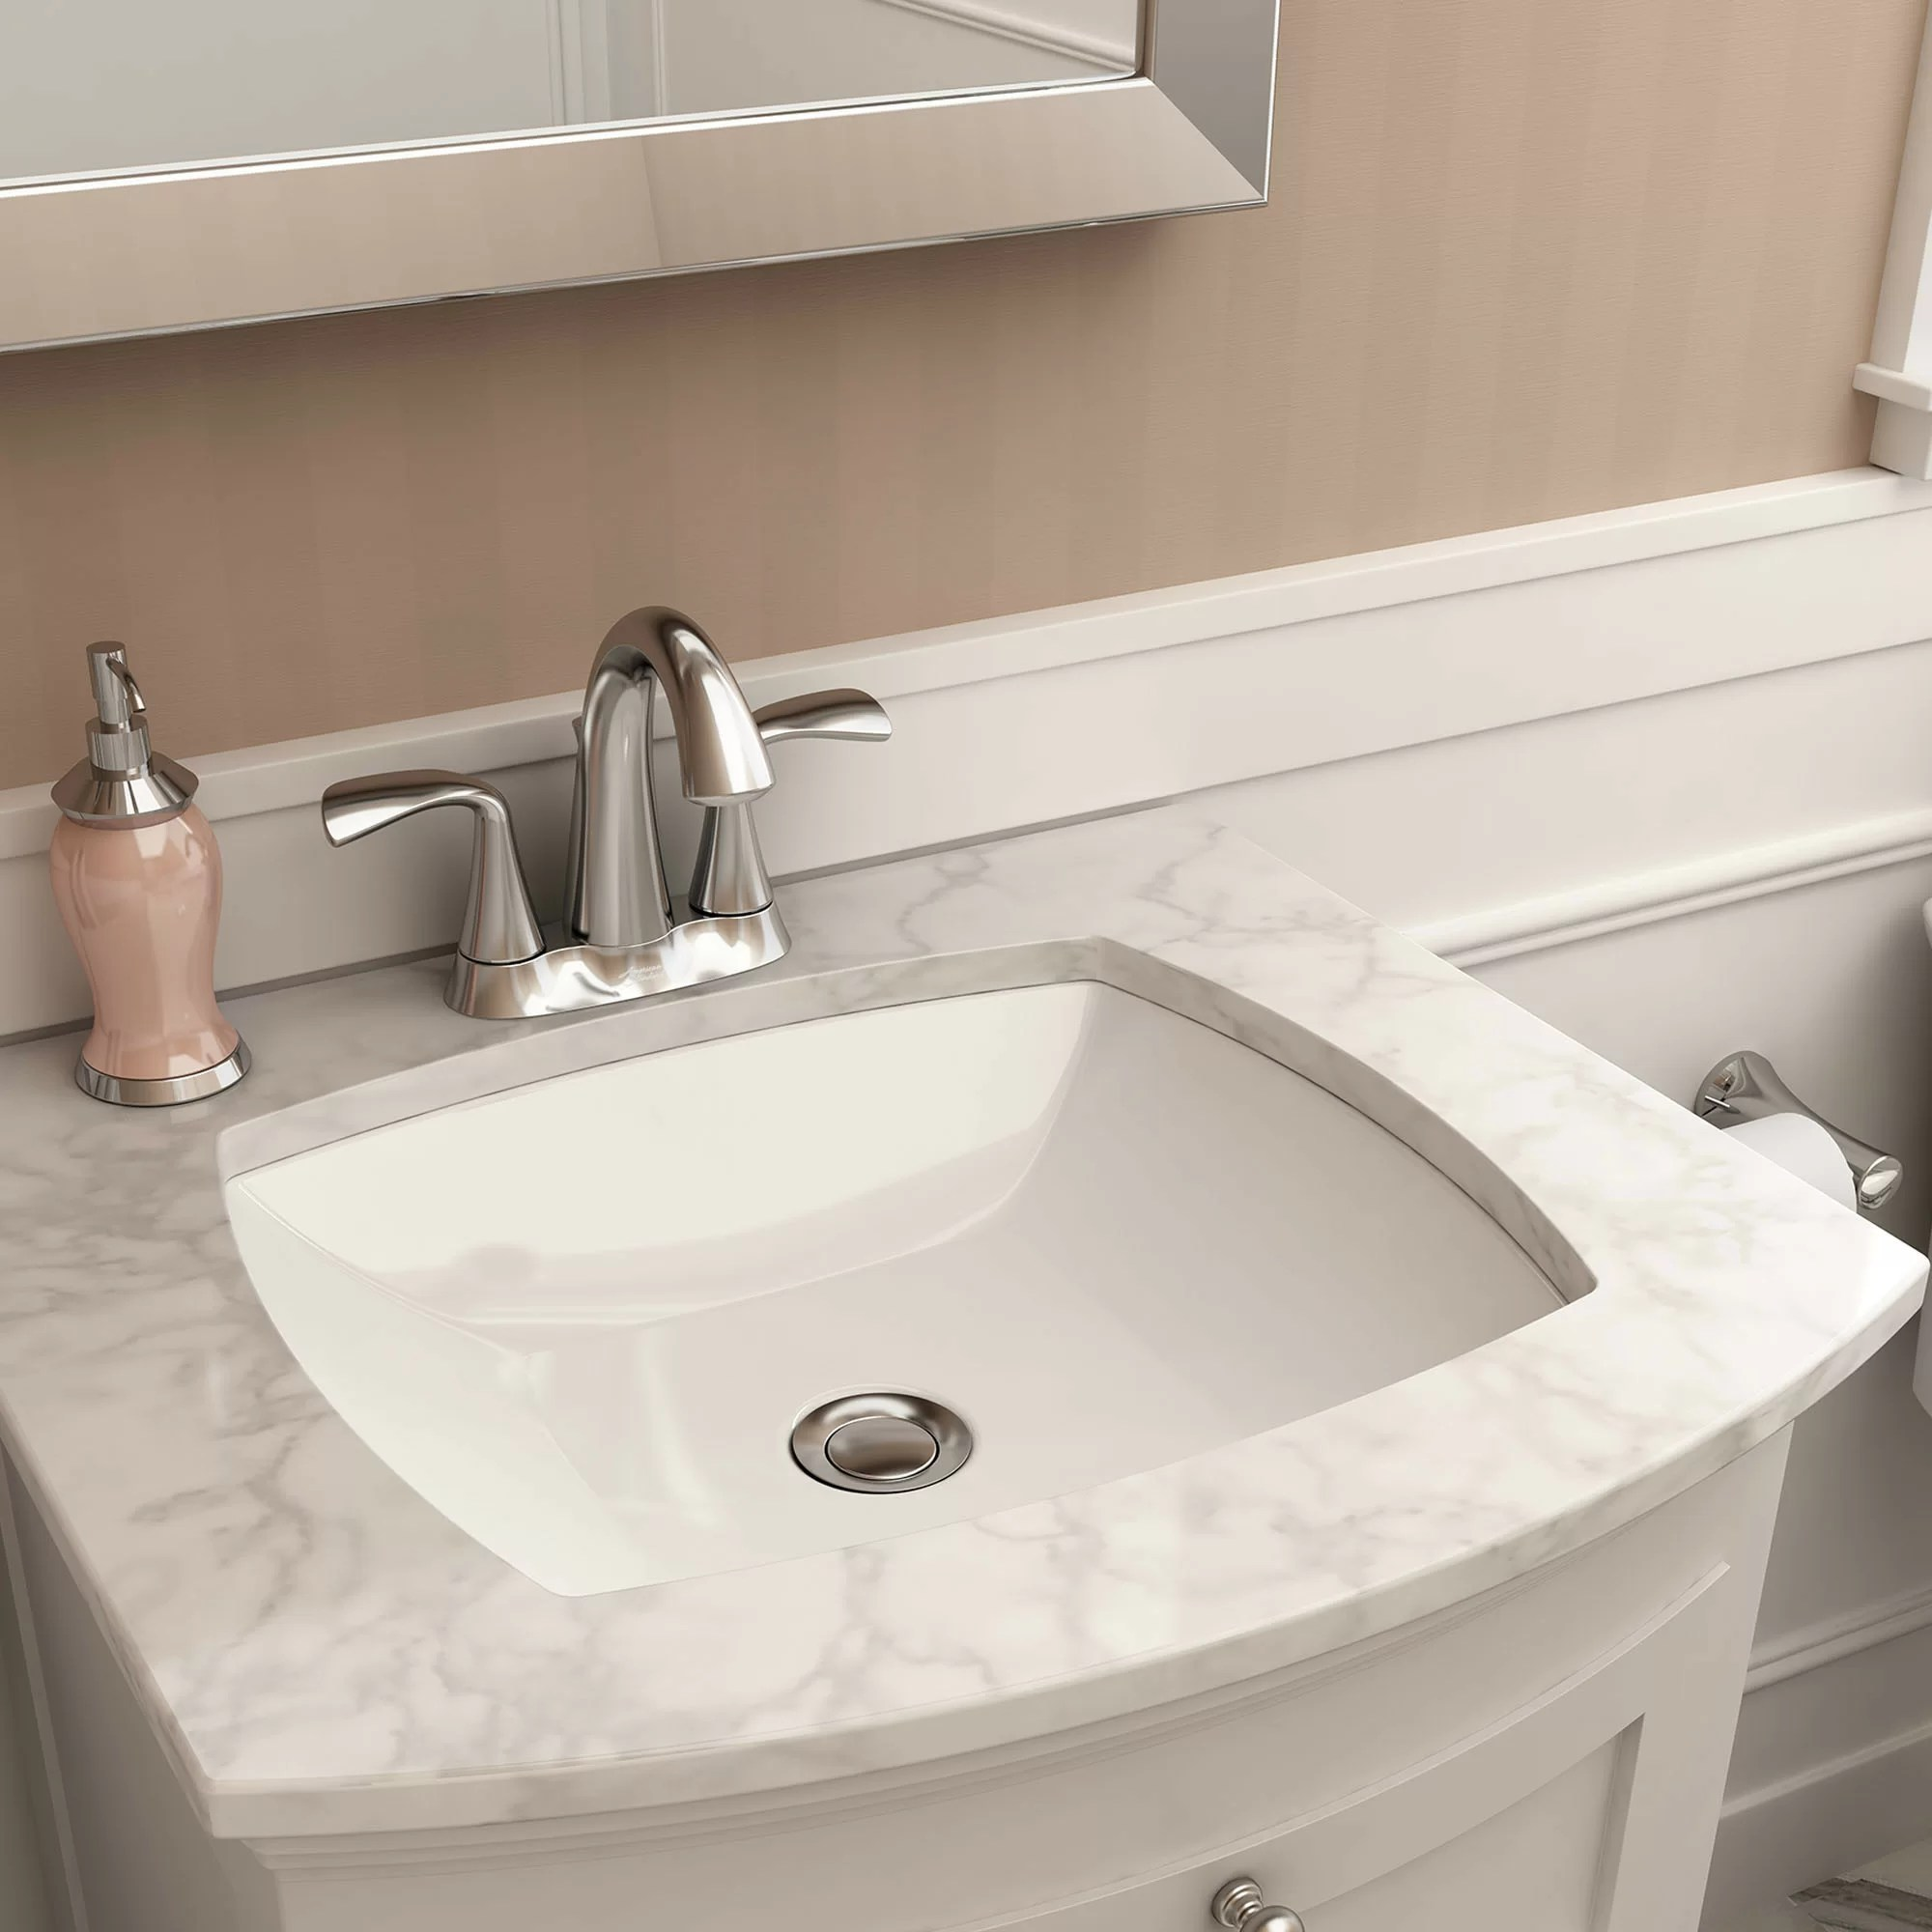 vessel sink top w polish faucet pop up